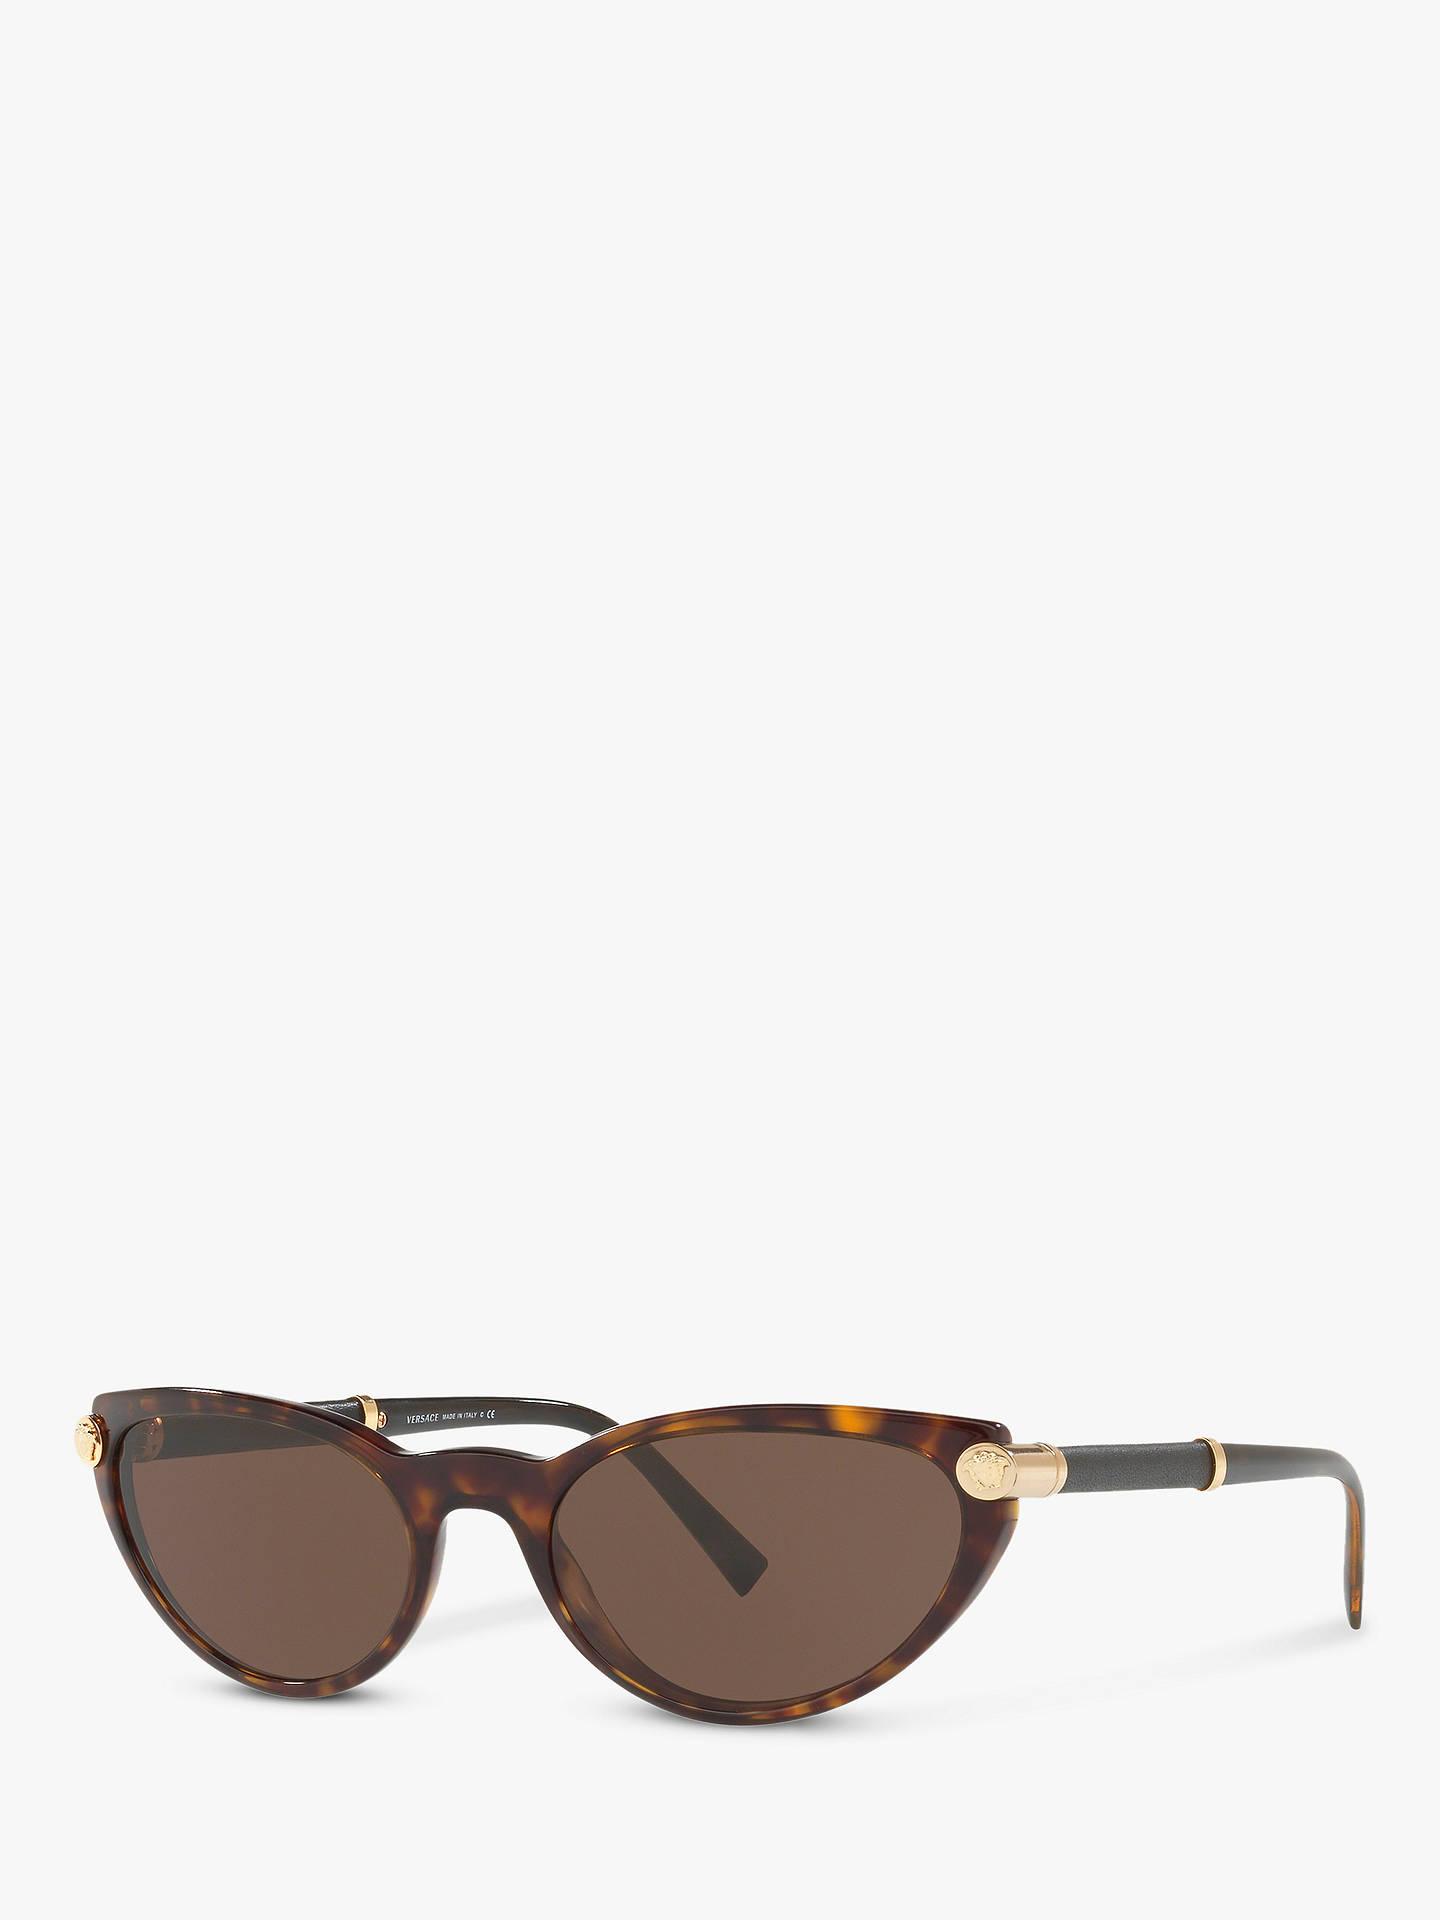 d336d805aa9b Versace VE4365Q Women s Cat s Eye Sunglasses at John Lewis   Partners